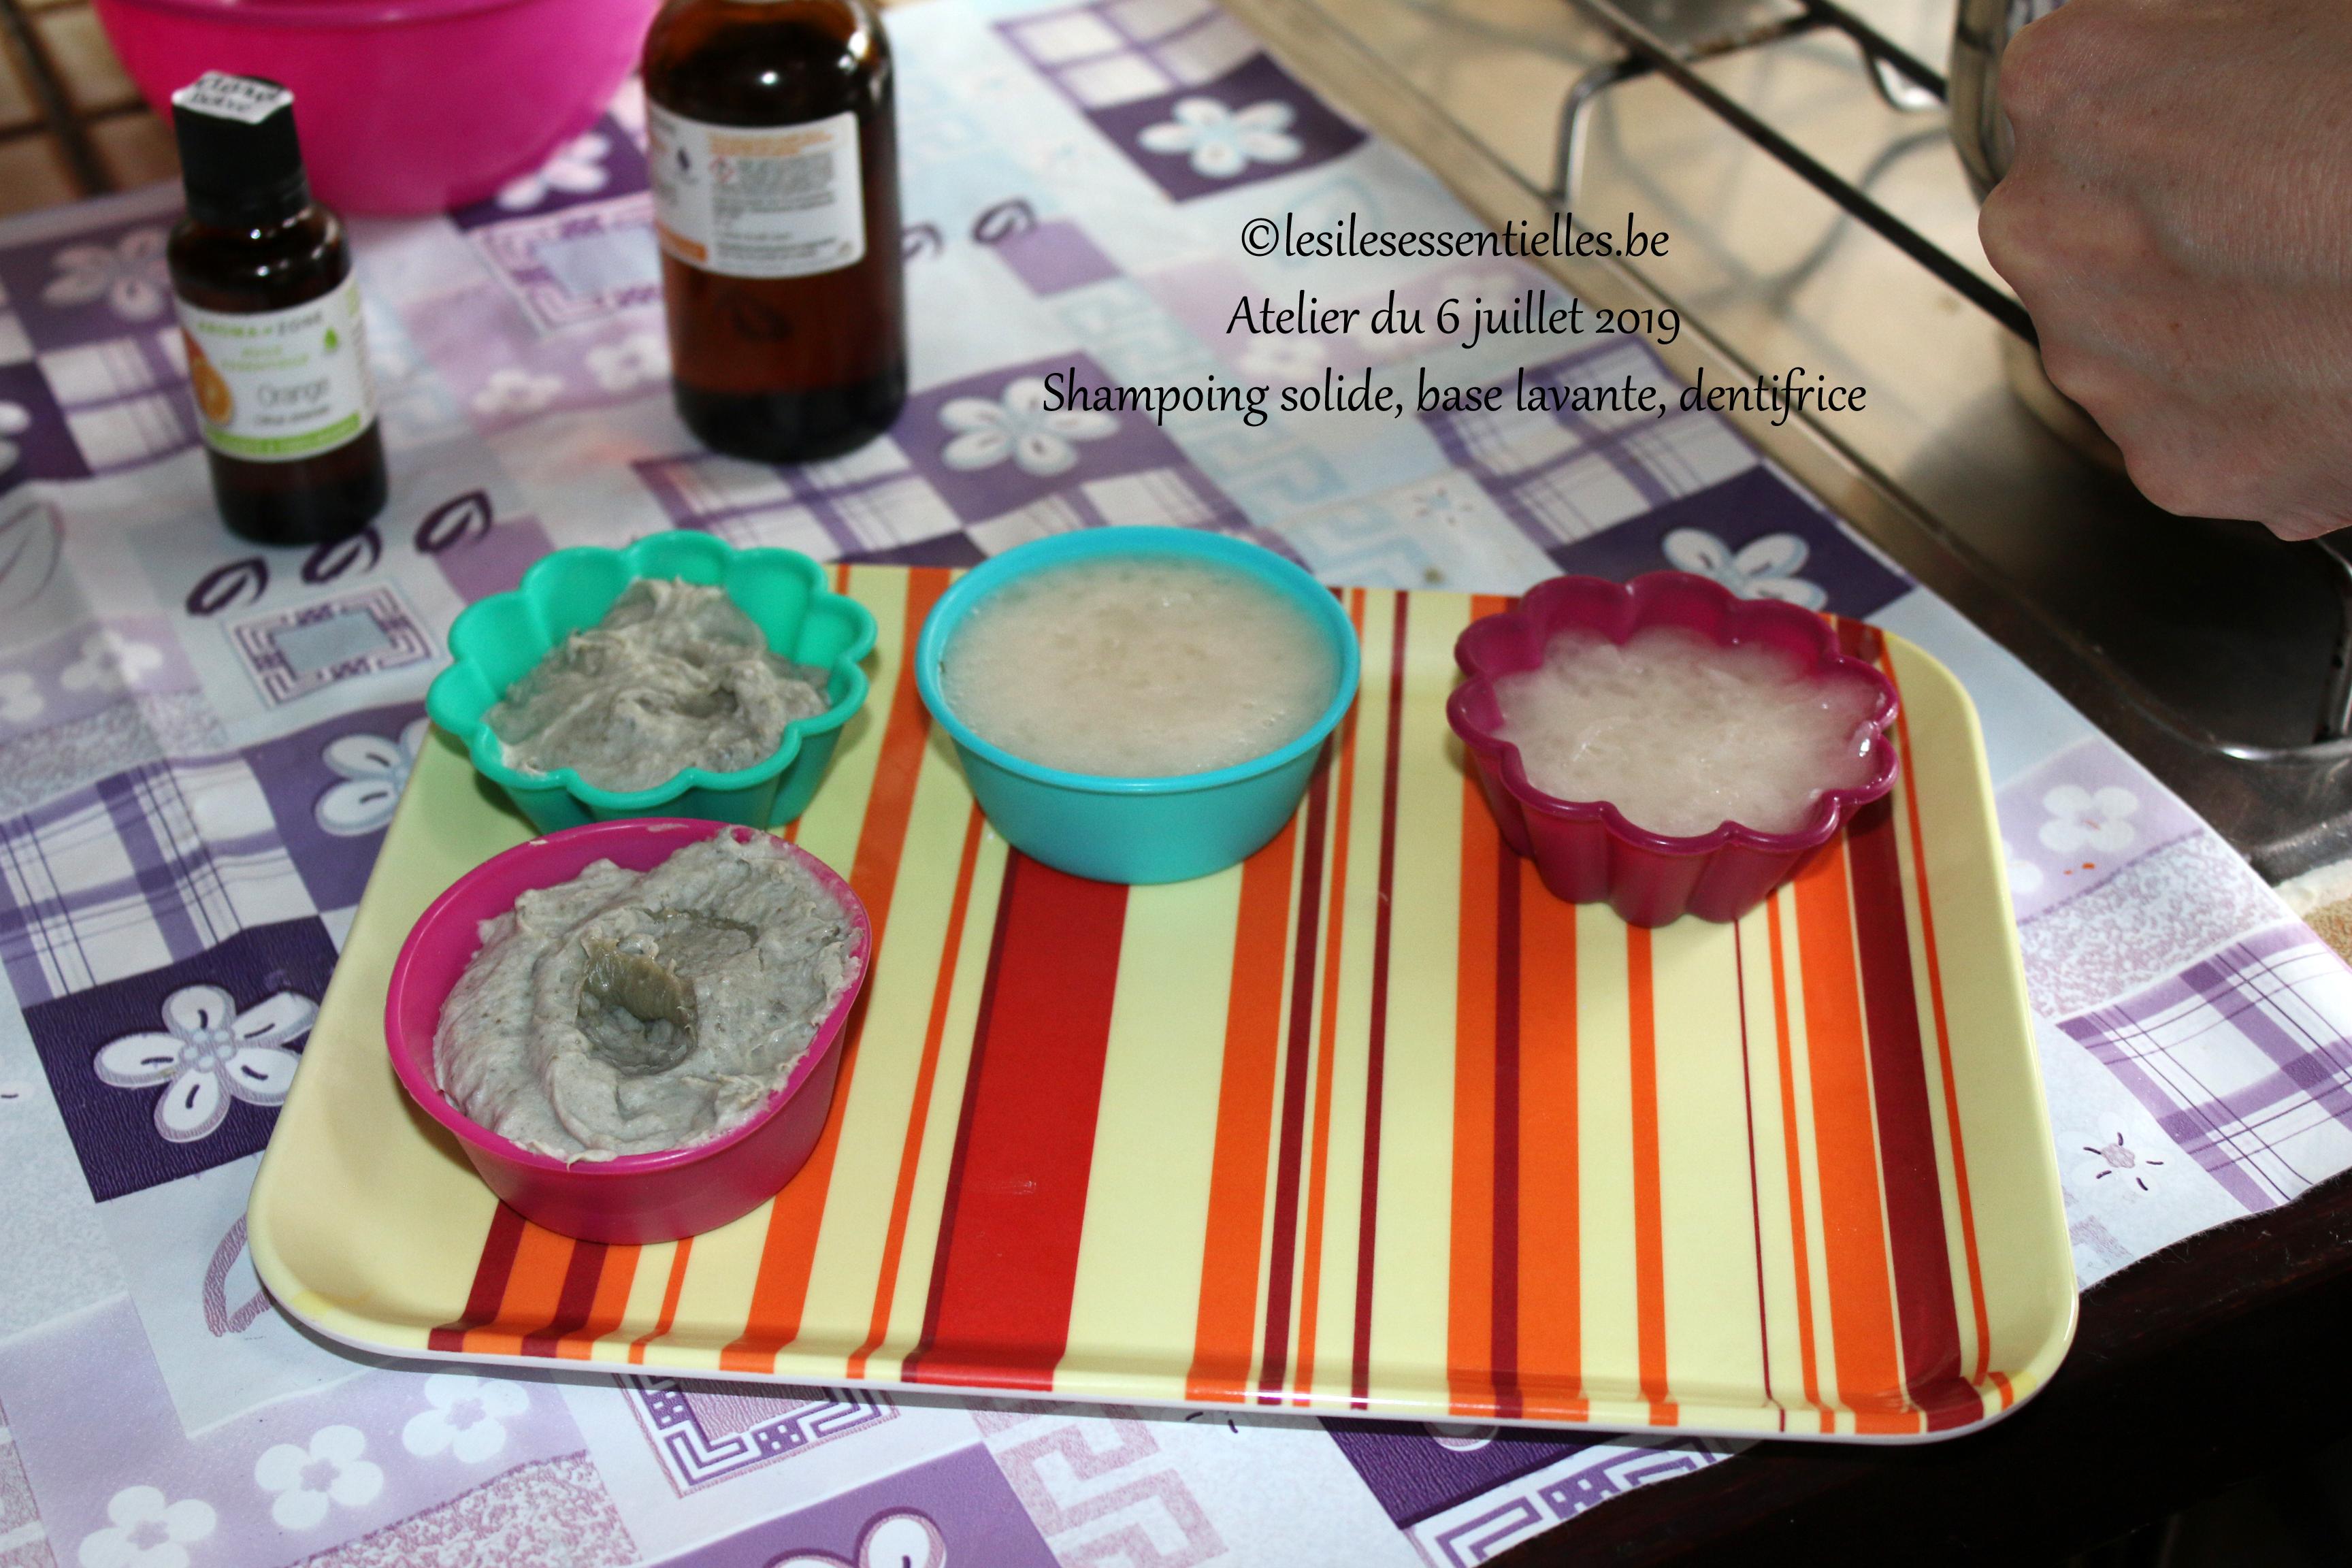 Shampoing solide, base lavante, dentifrice